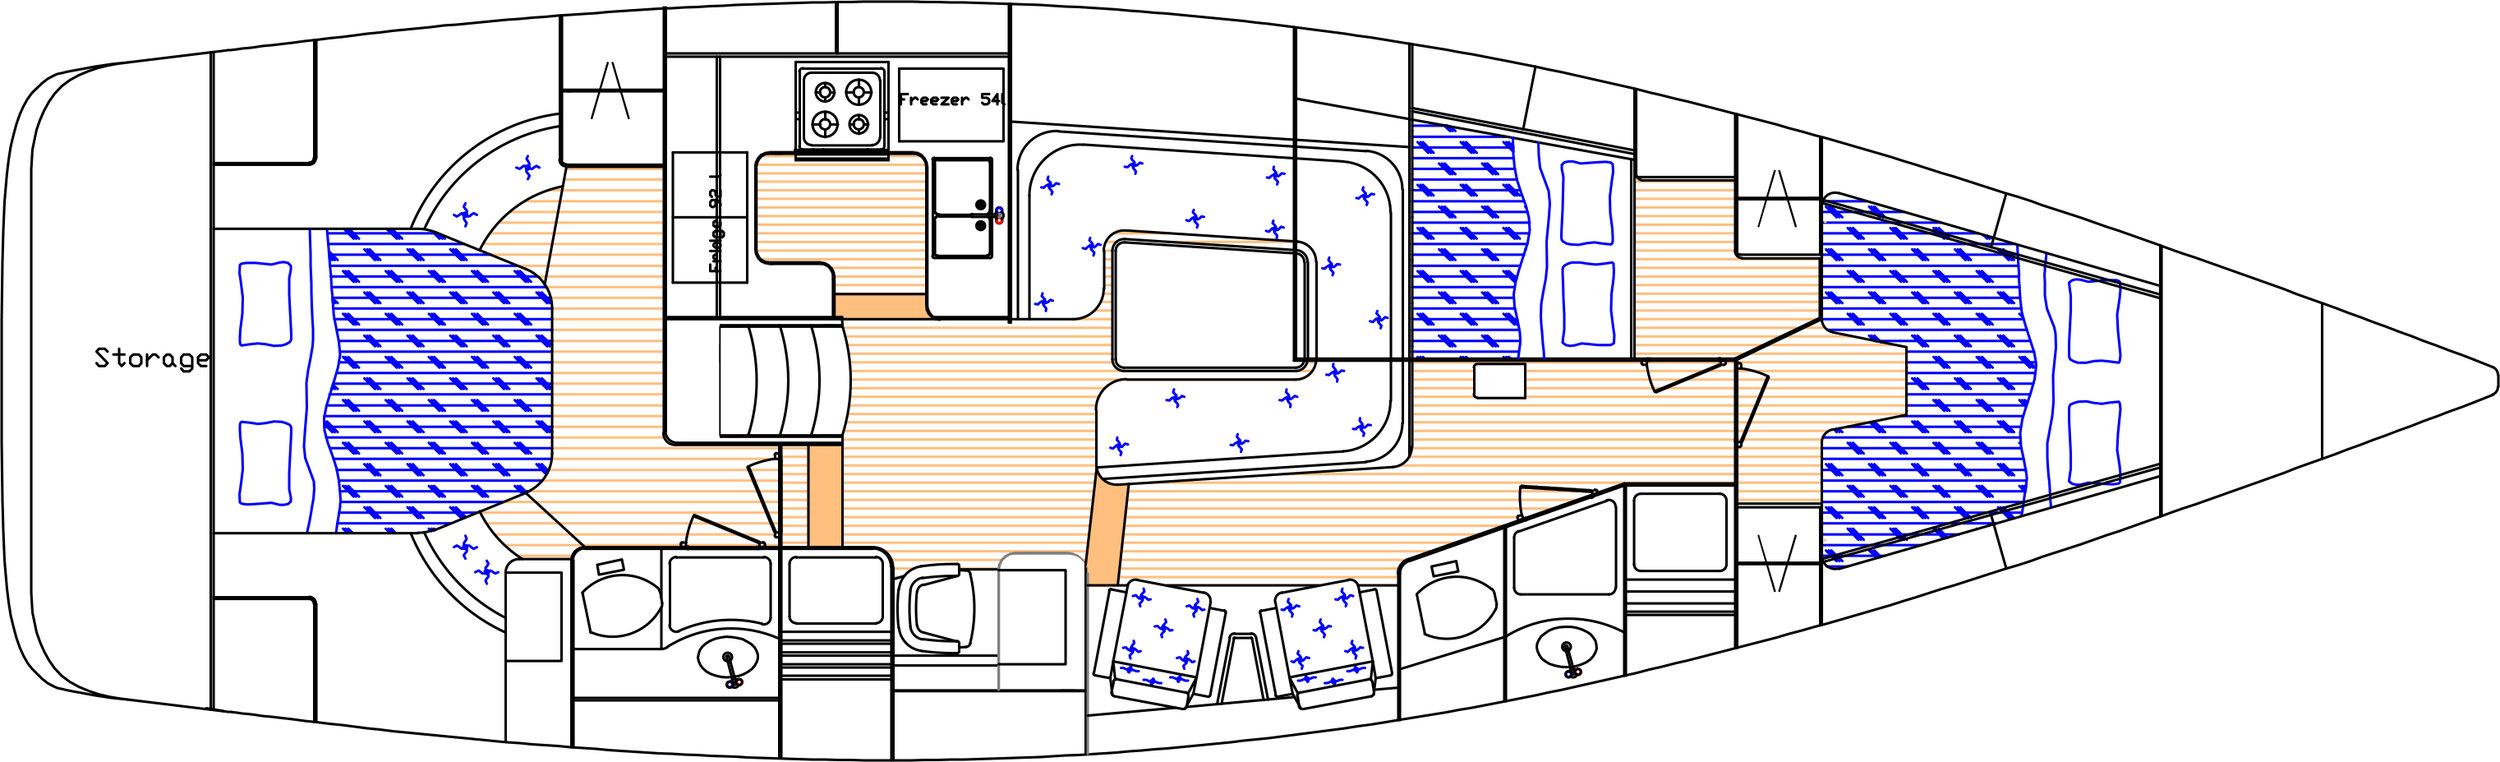 CR 490 DS Interior 1.jpg